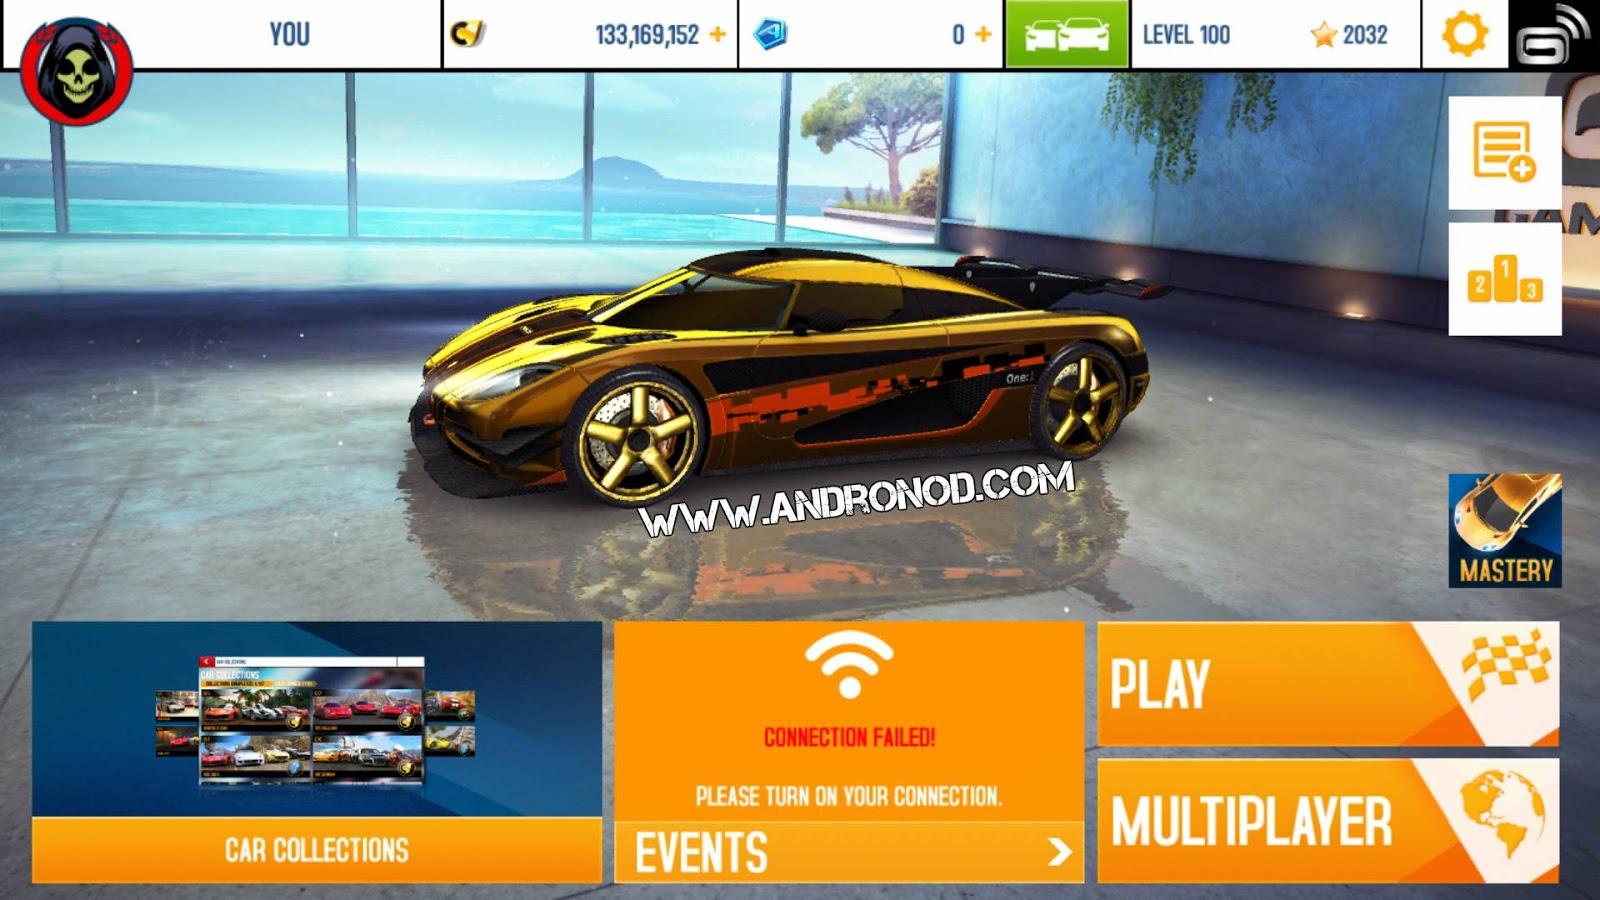 Asphalt 8 nitro apk android oyun club   Asphalt Nitro Mod APK